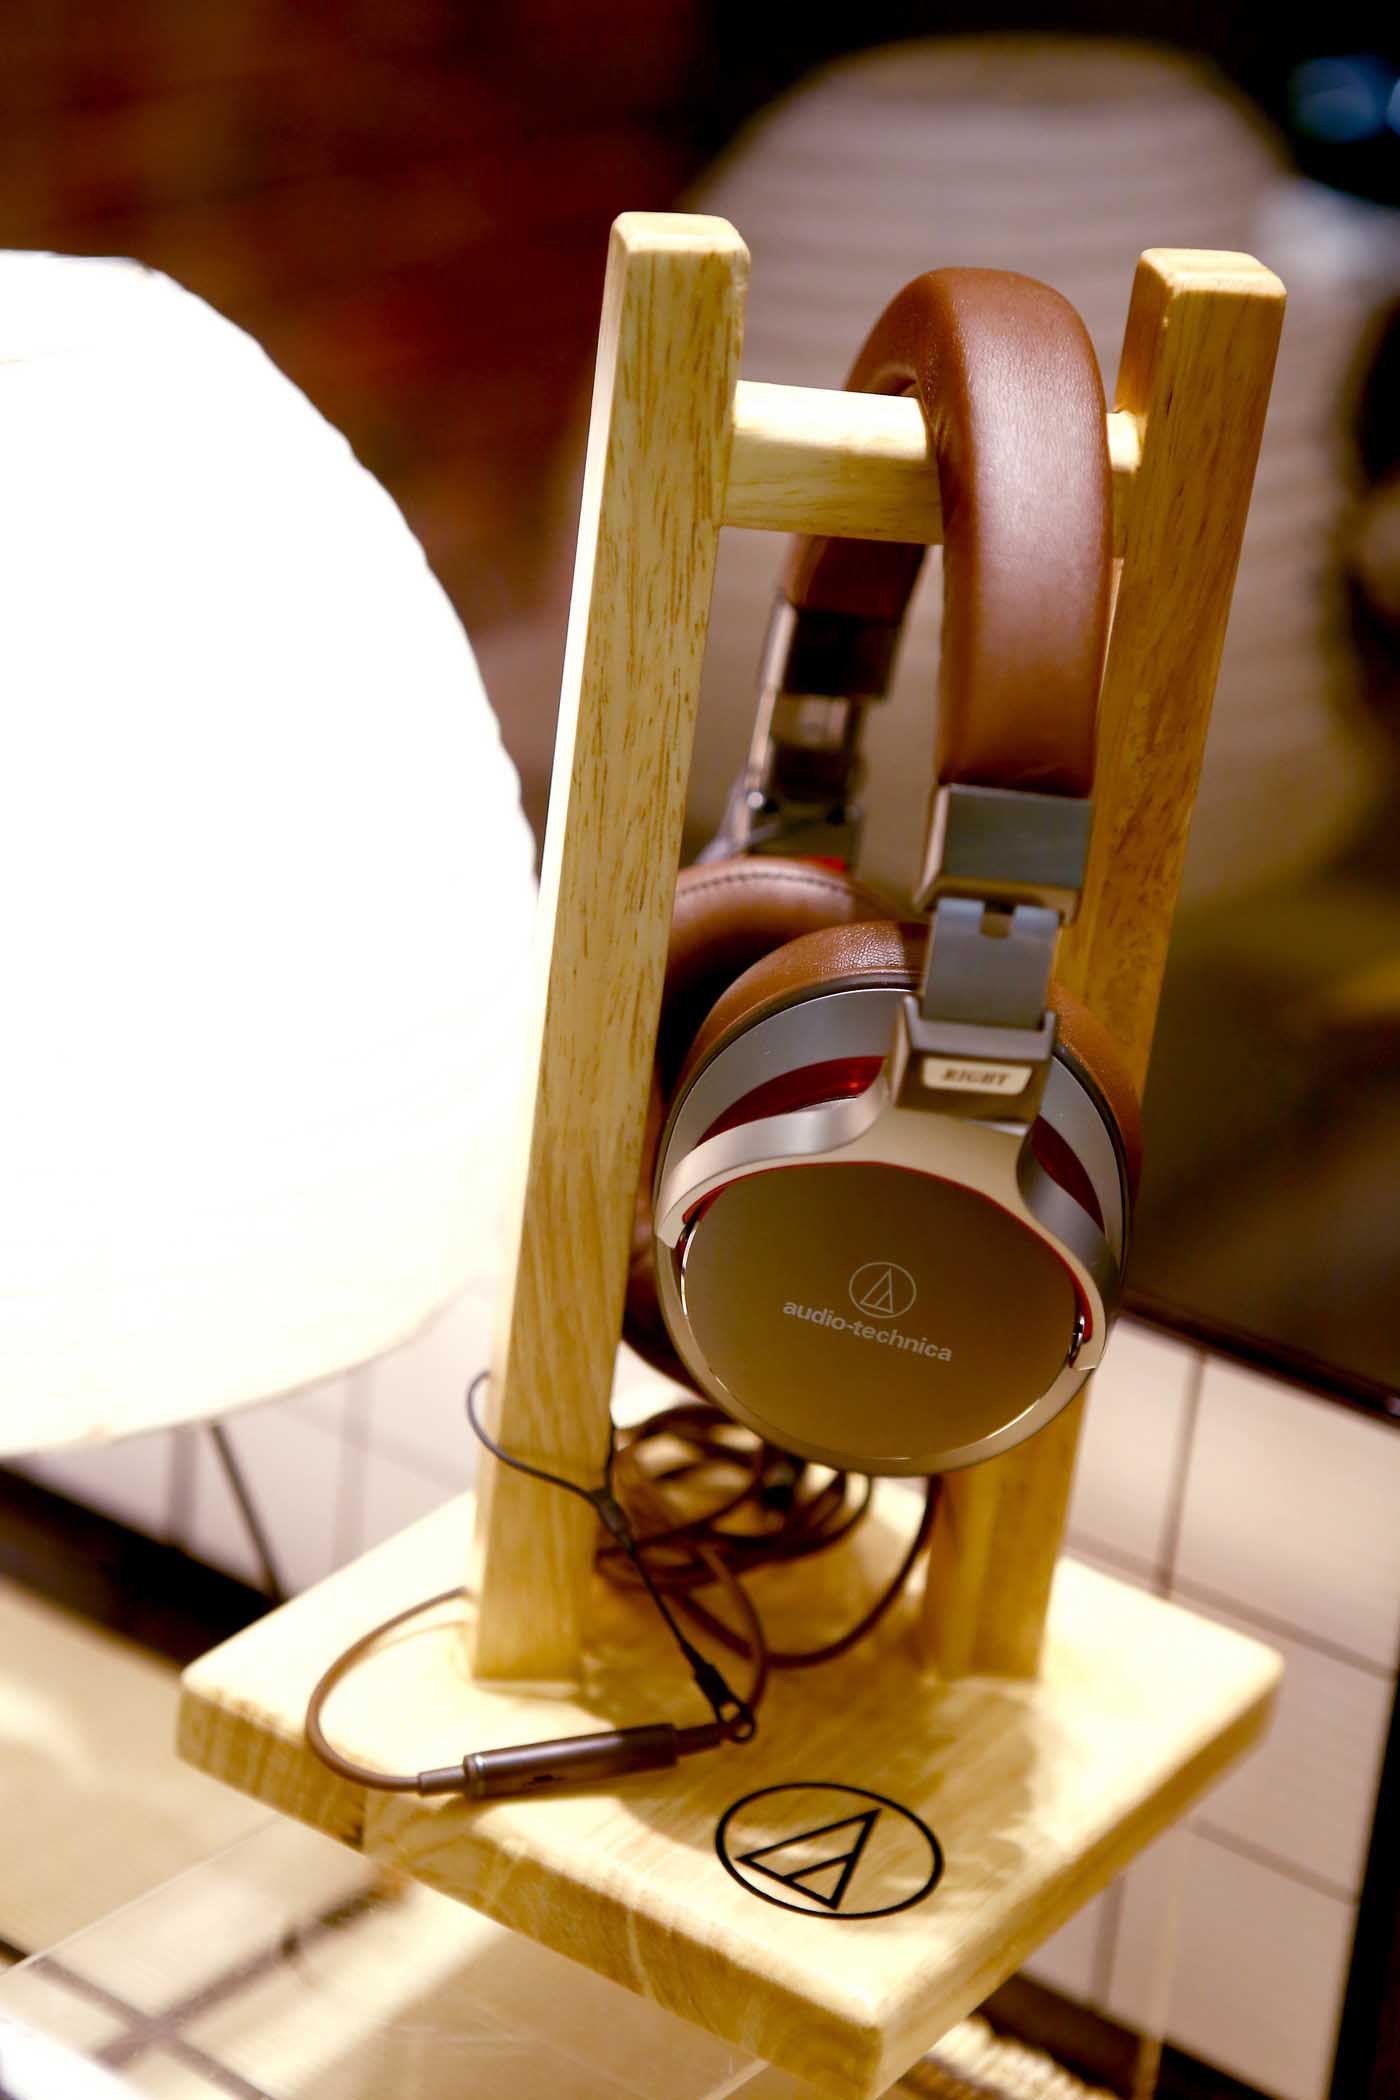 Pic RTB Munkong Audio Technica 22